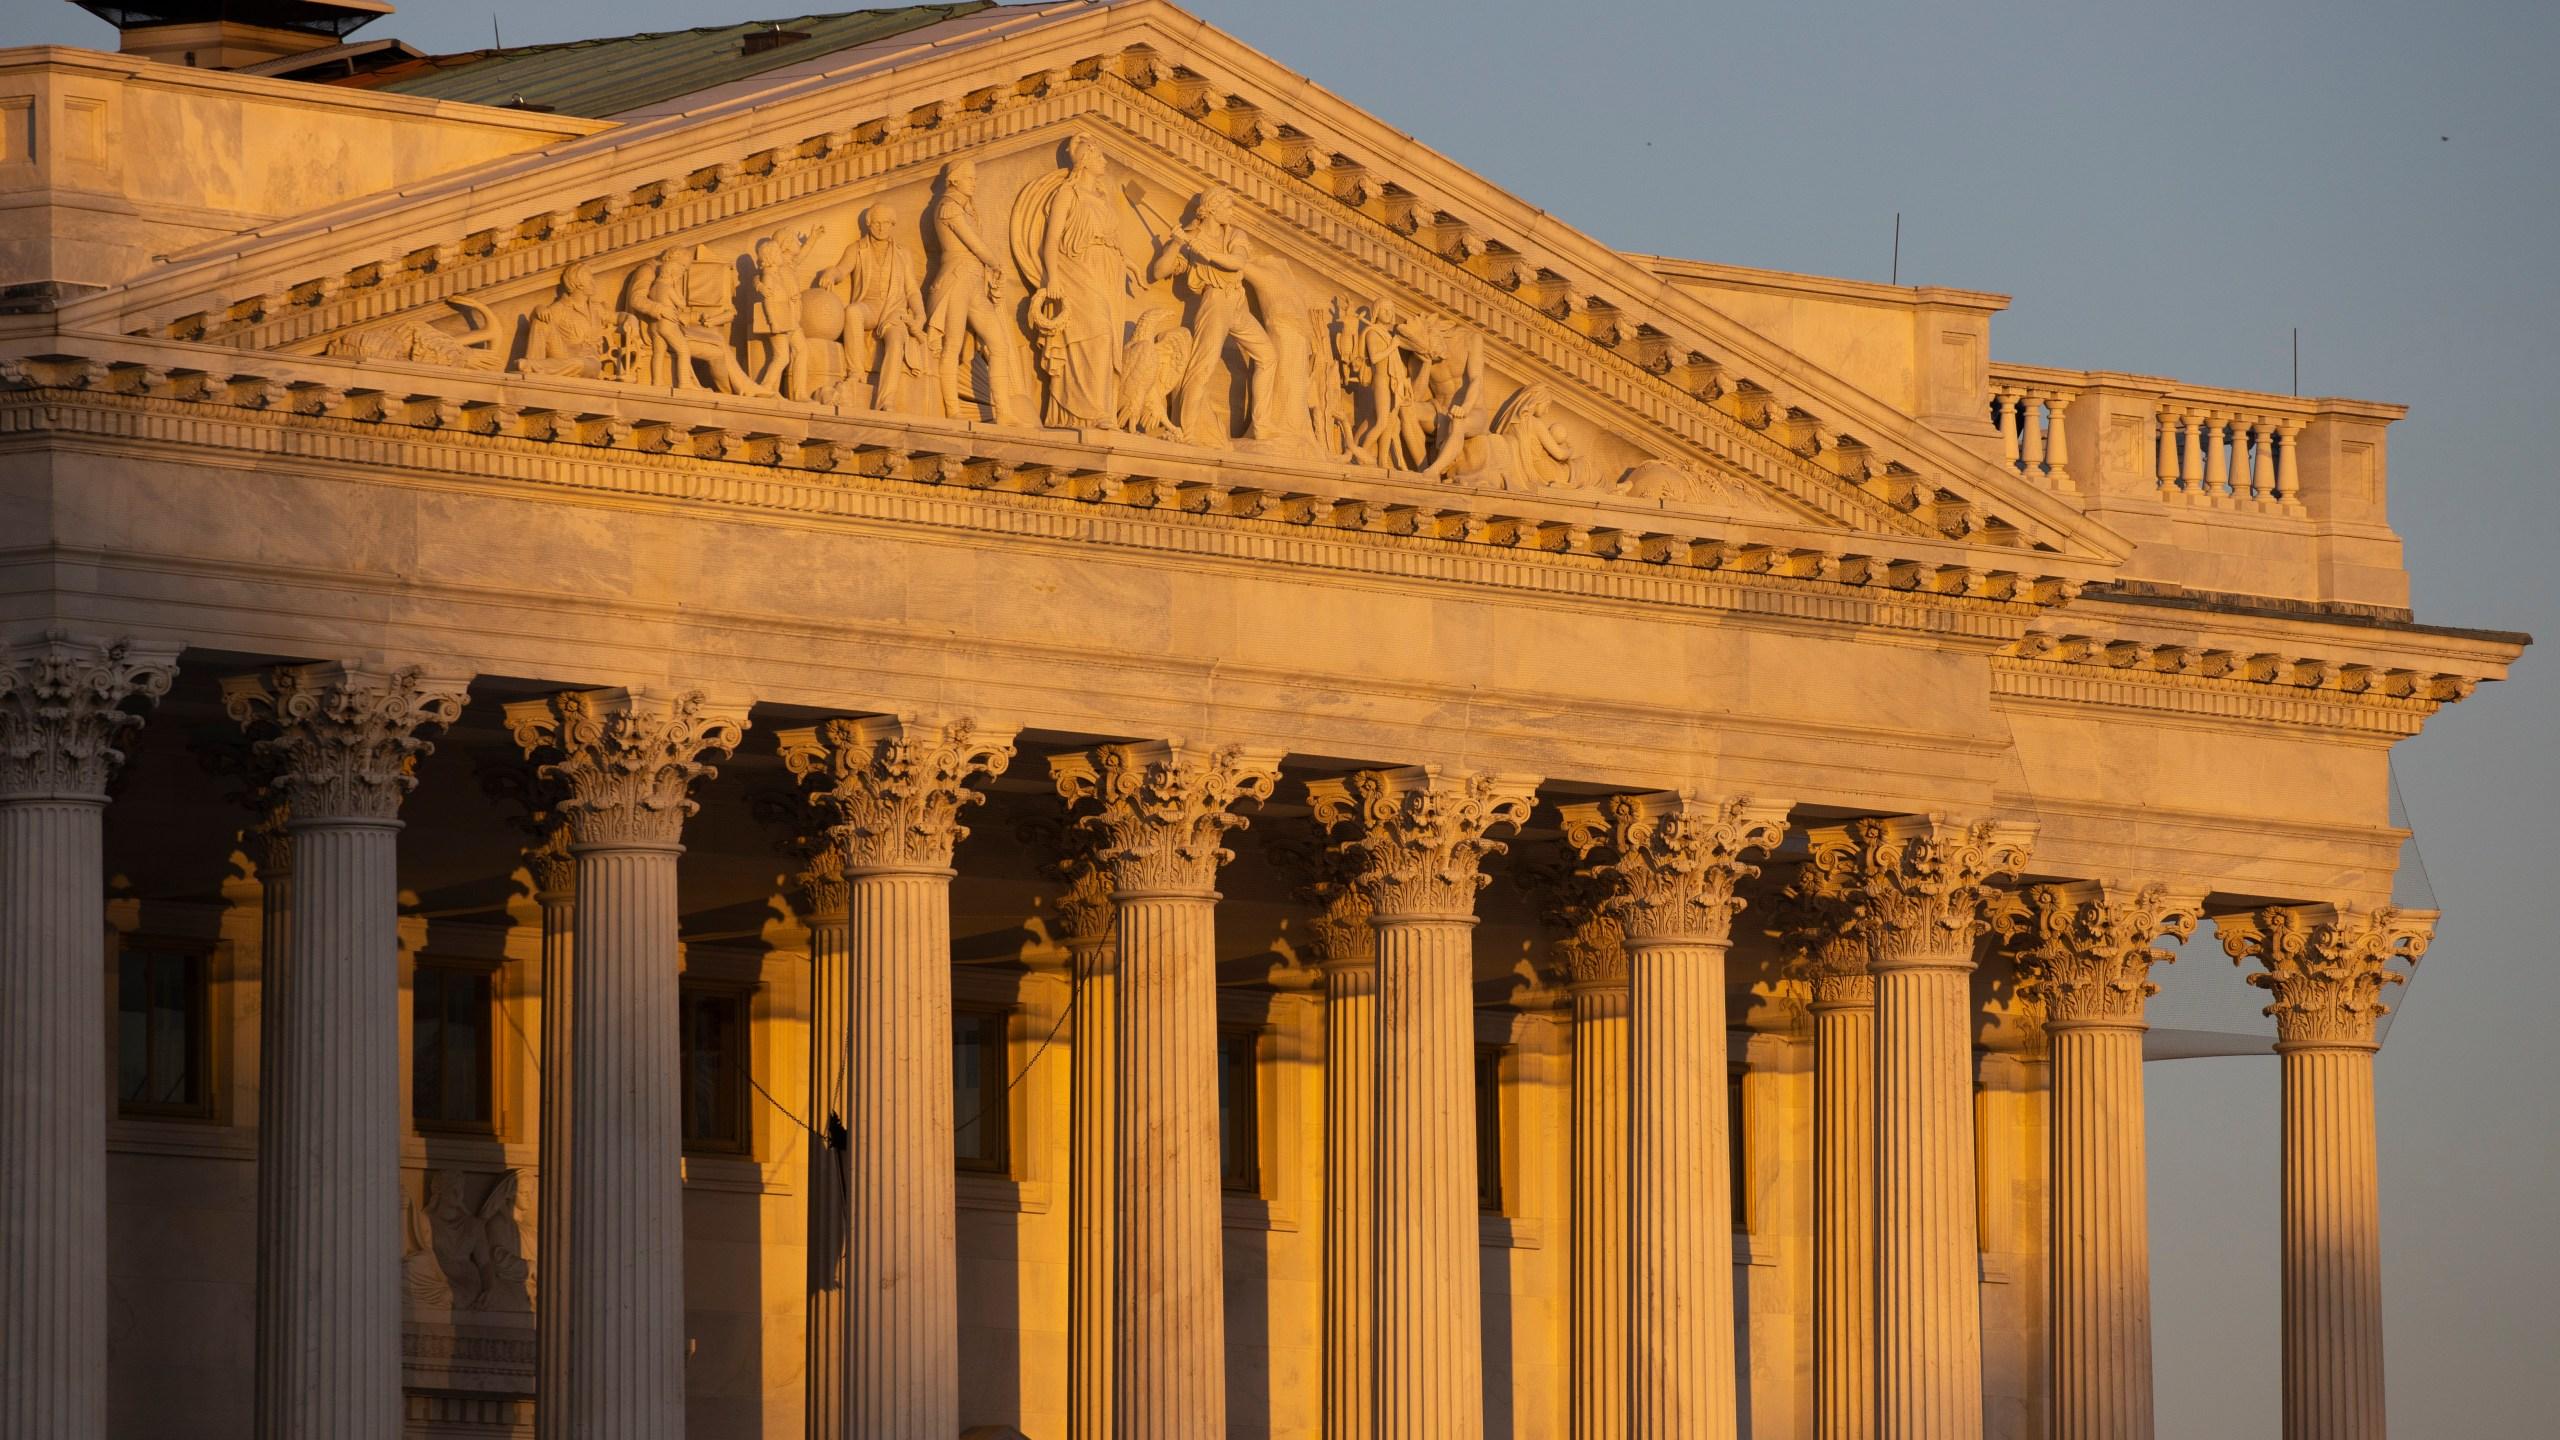 The Senate side of the U.S. Capitol at sunrise on Monday, Jan. 20, 2020